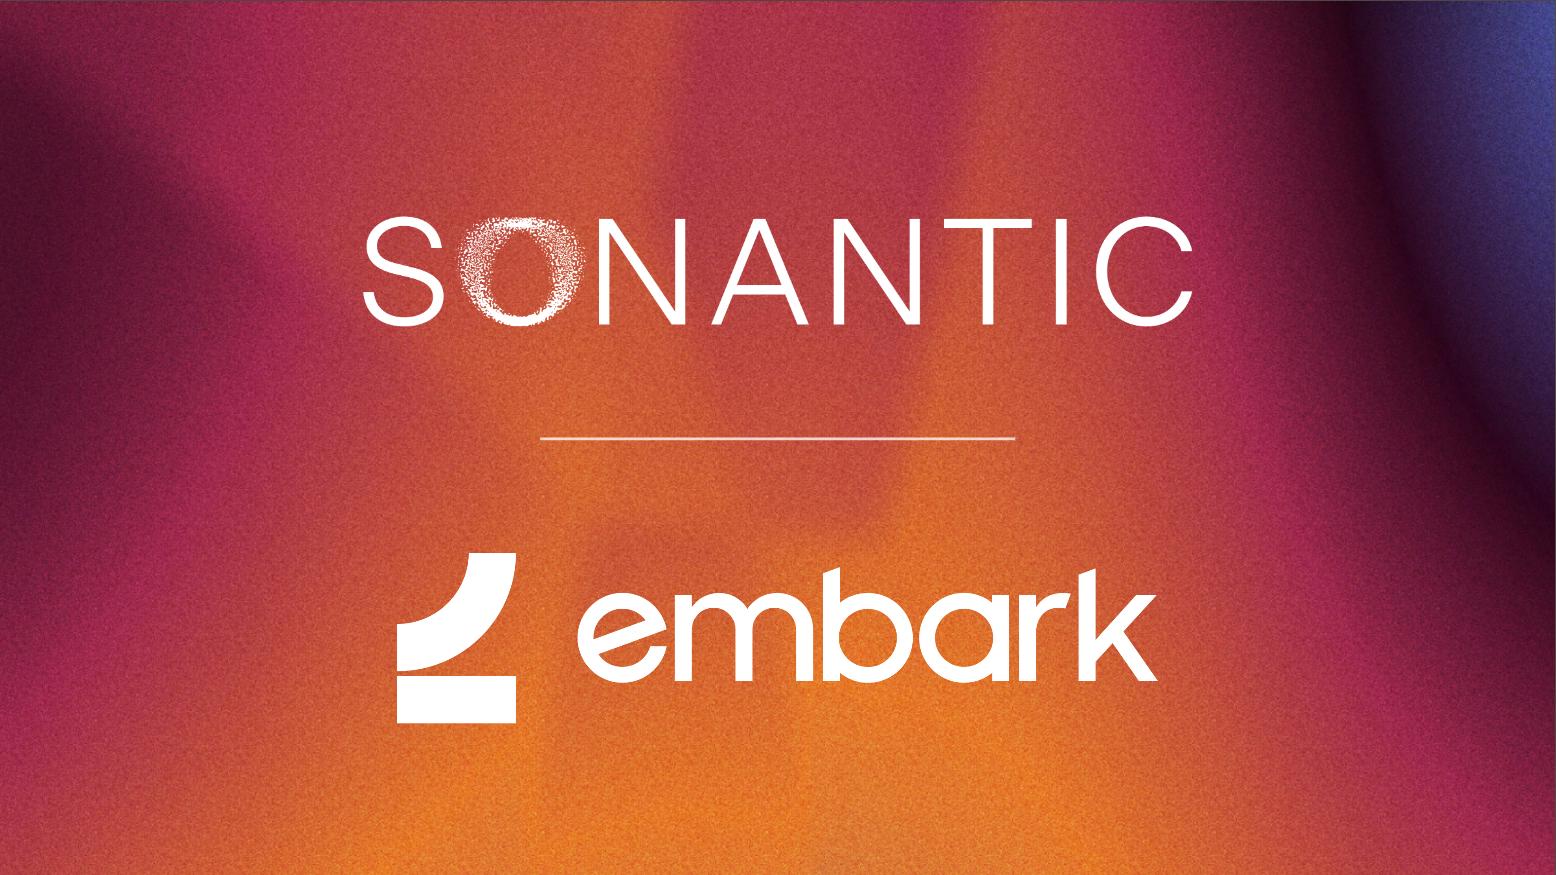 Sonantic & Embark Studios partner